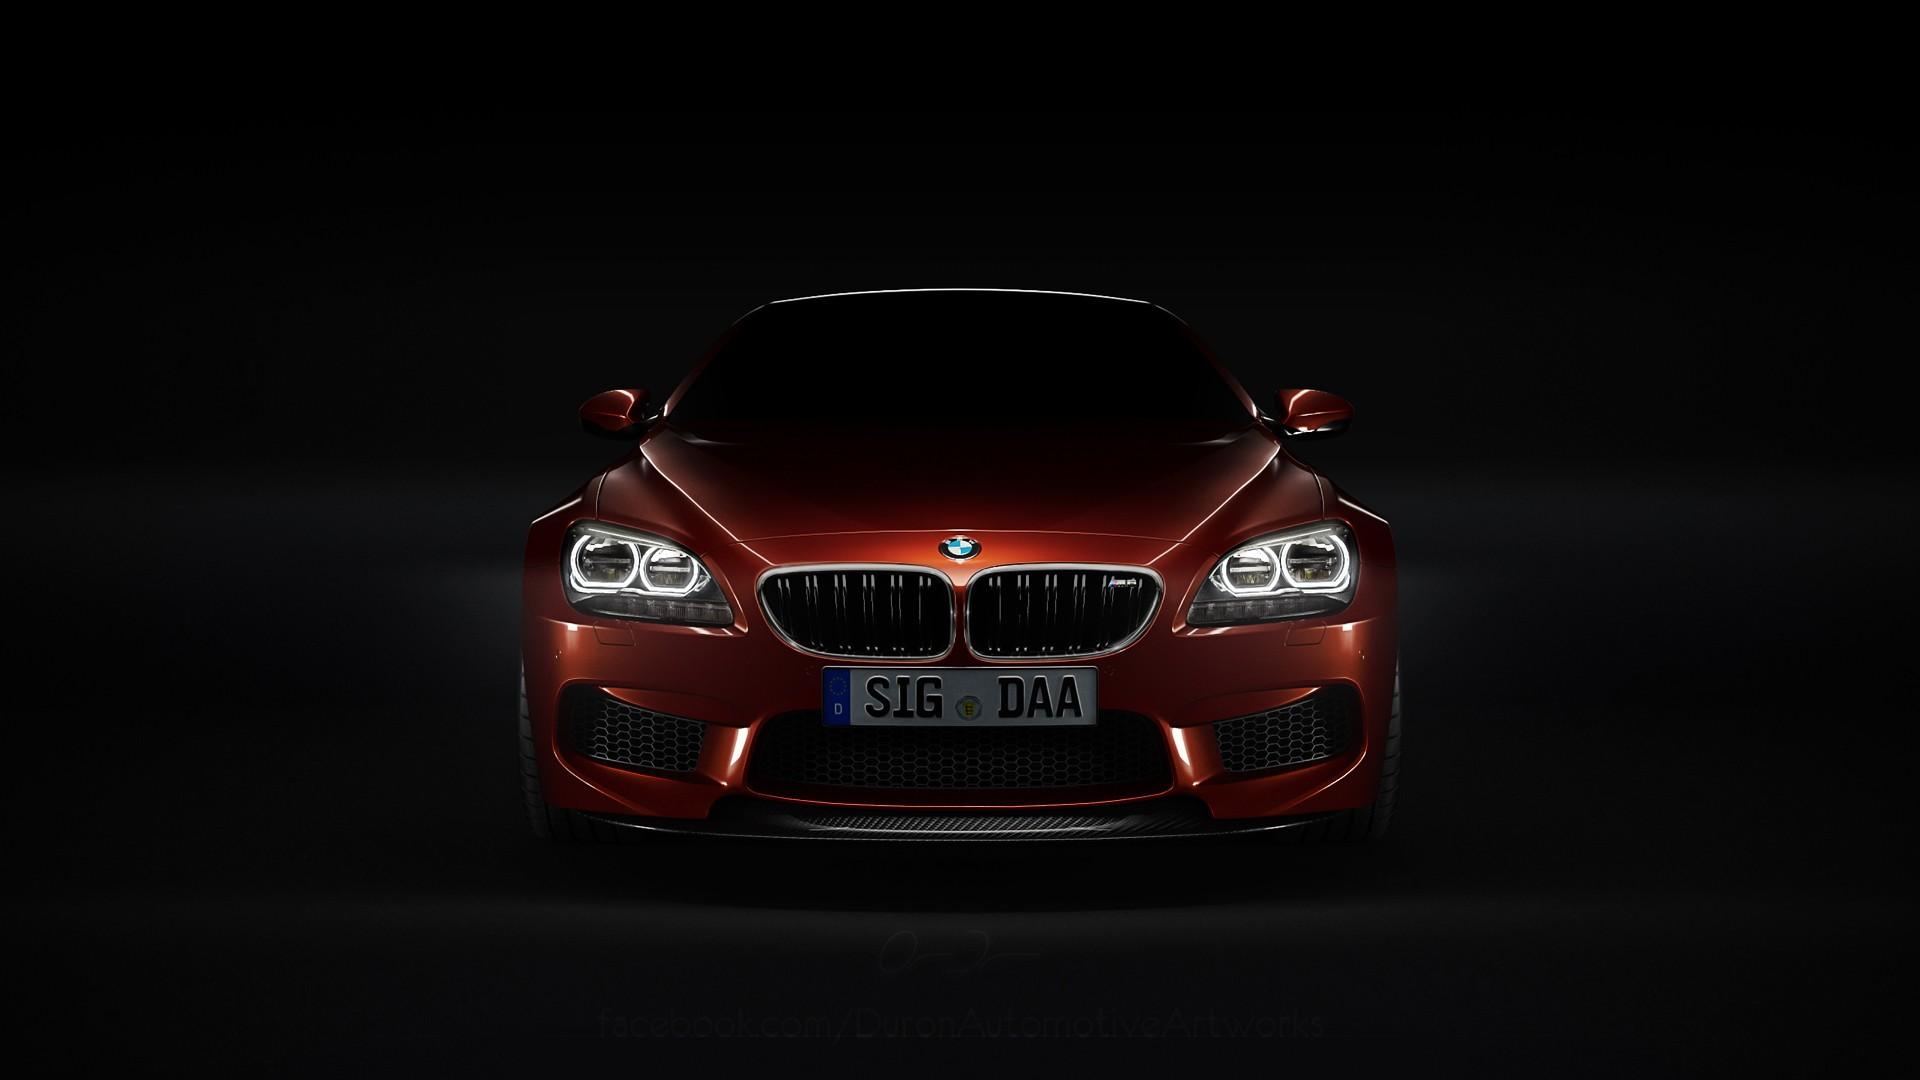 Download Wallpaper 3415x3415 Bmw Headlights Car Cloudy: DeviantART Vehicles BMW M6 Black Background Headlights